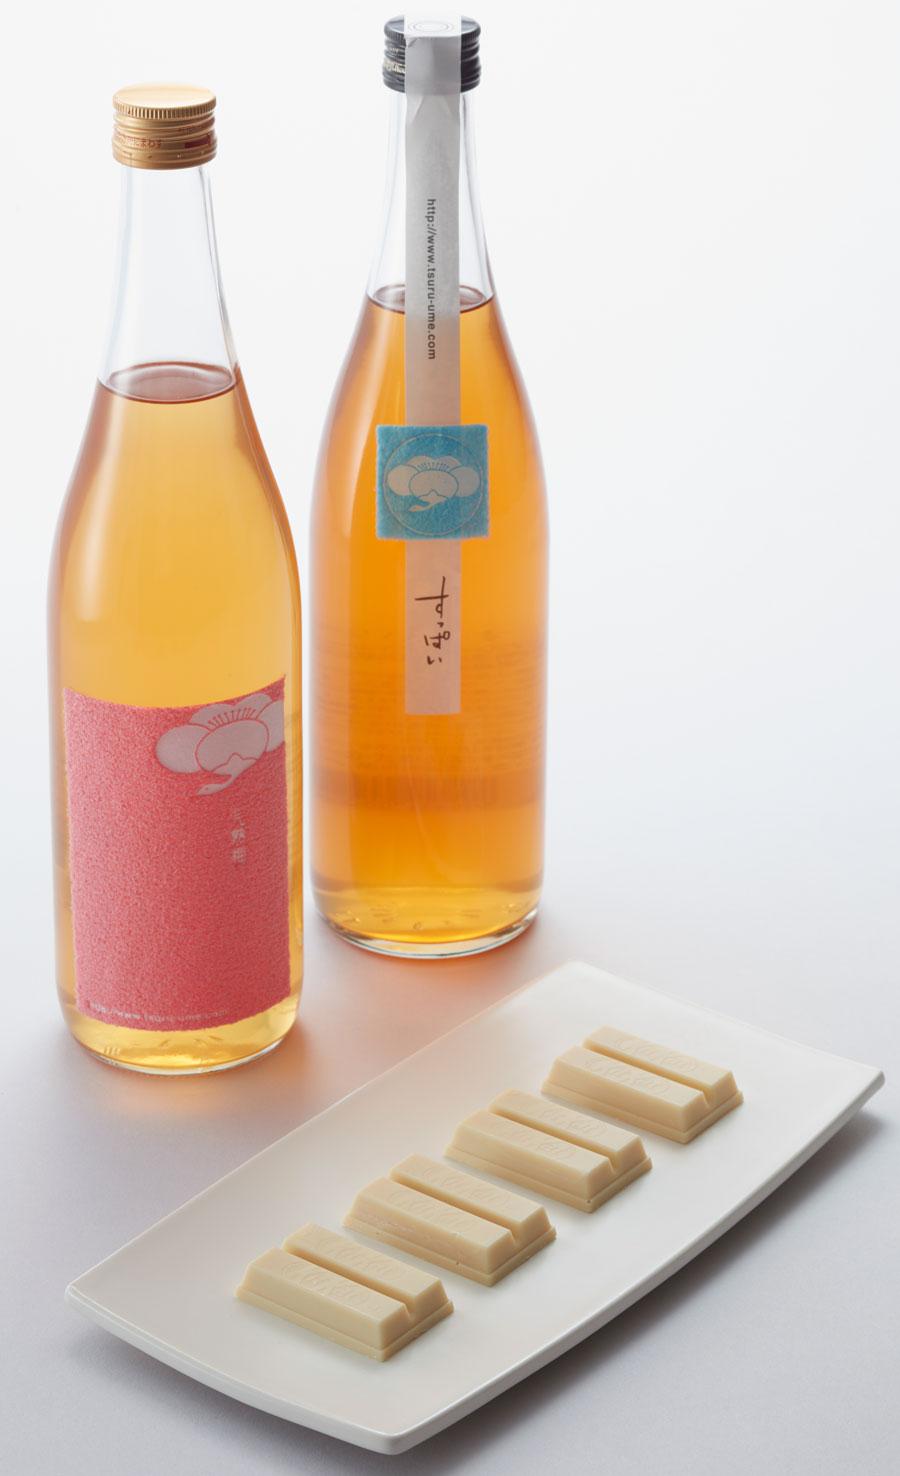 Kit Kat Umeshu: Chocolate e Umeshu